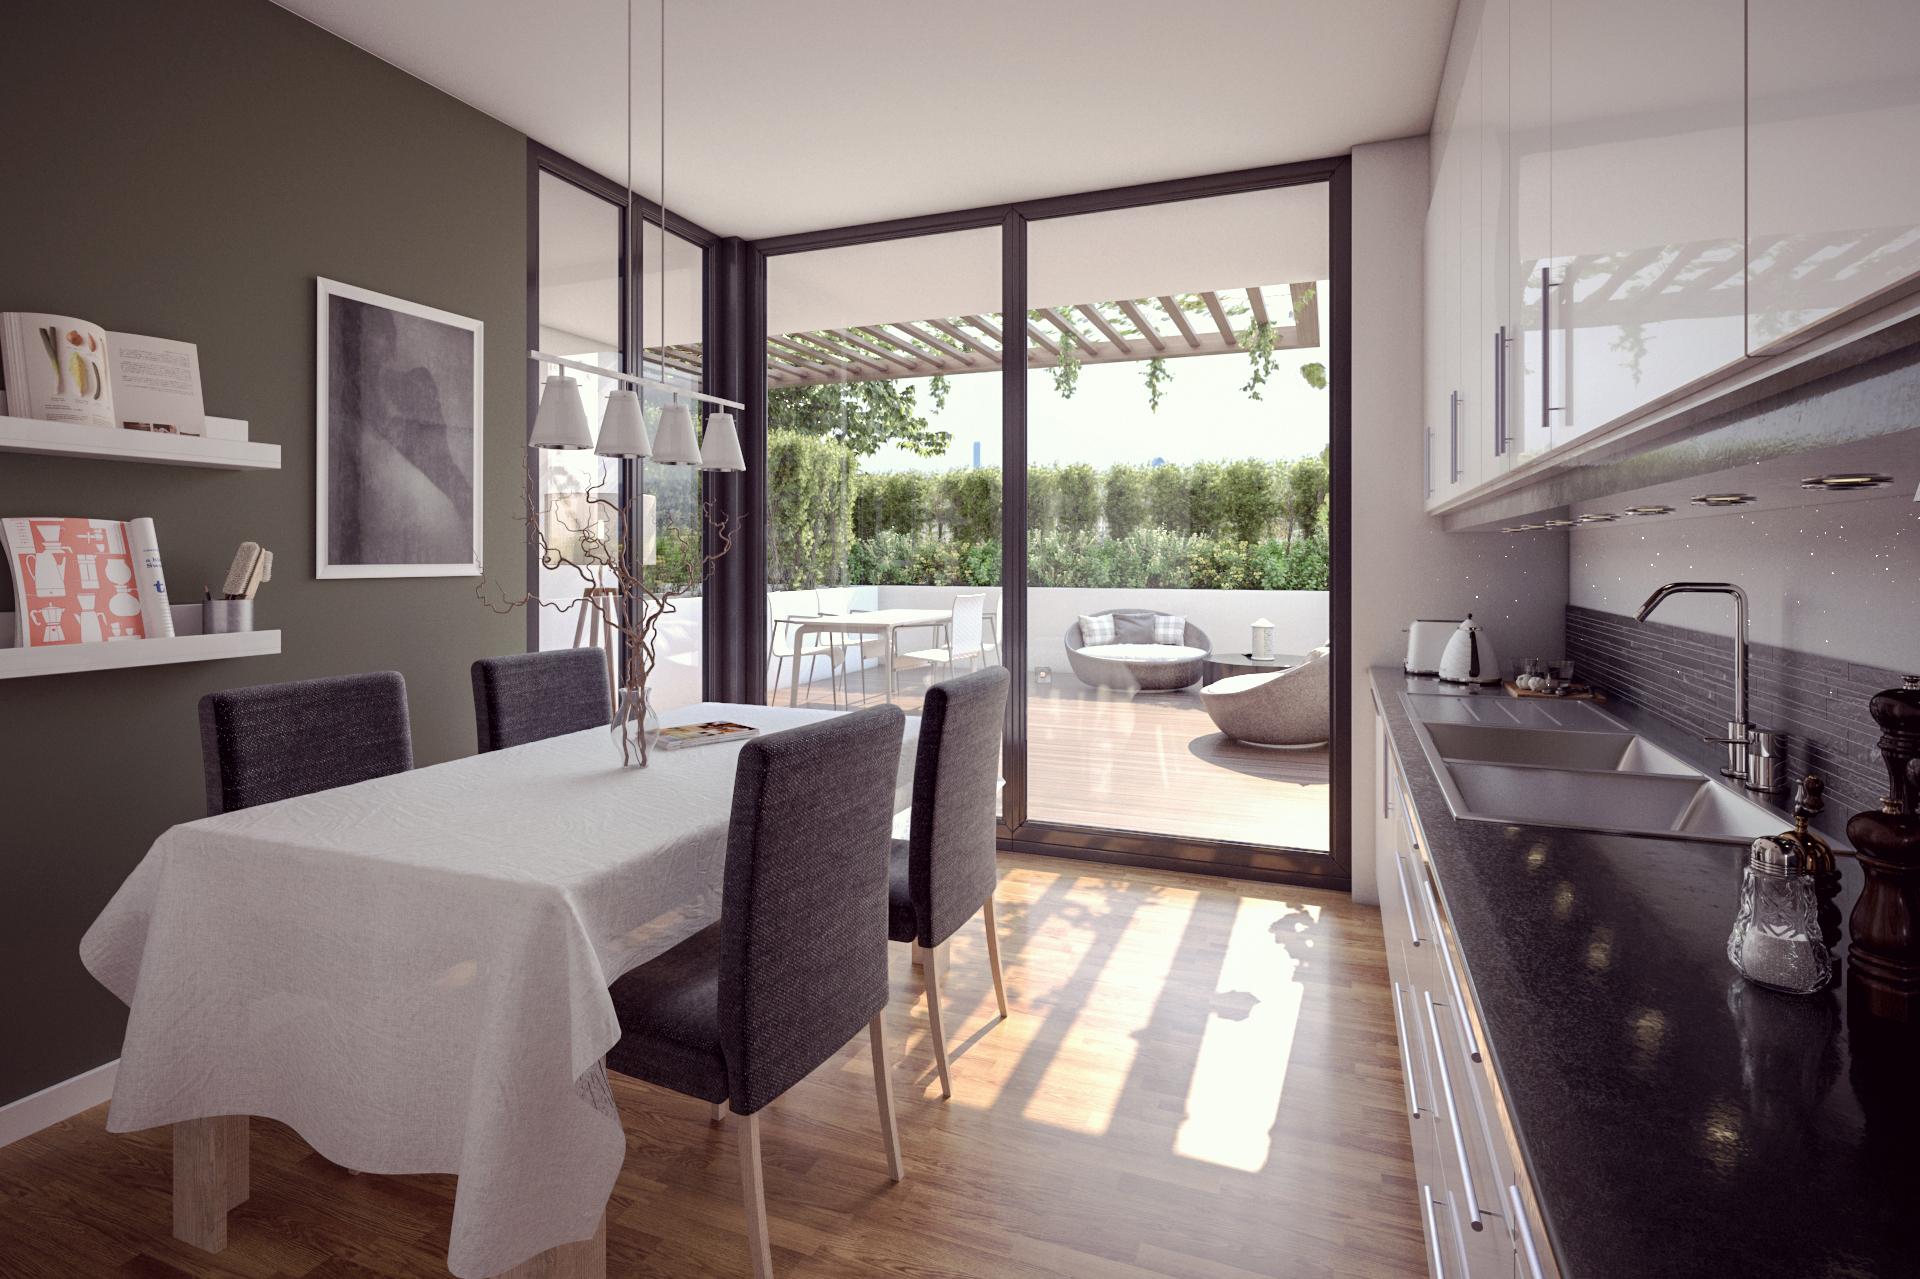 living room salotto rendering